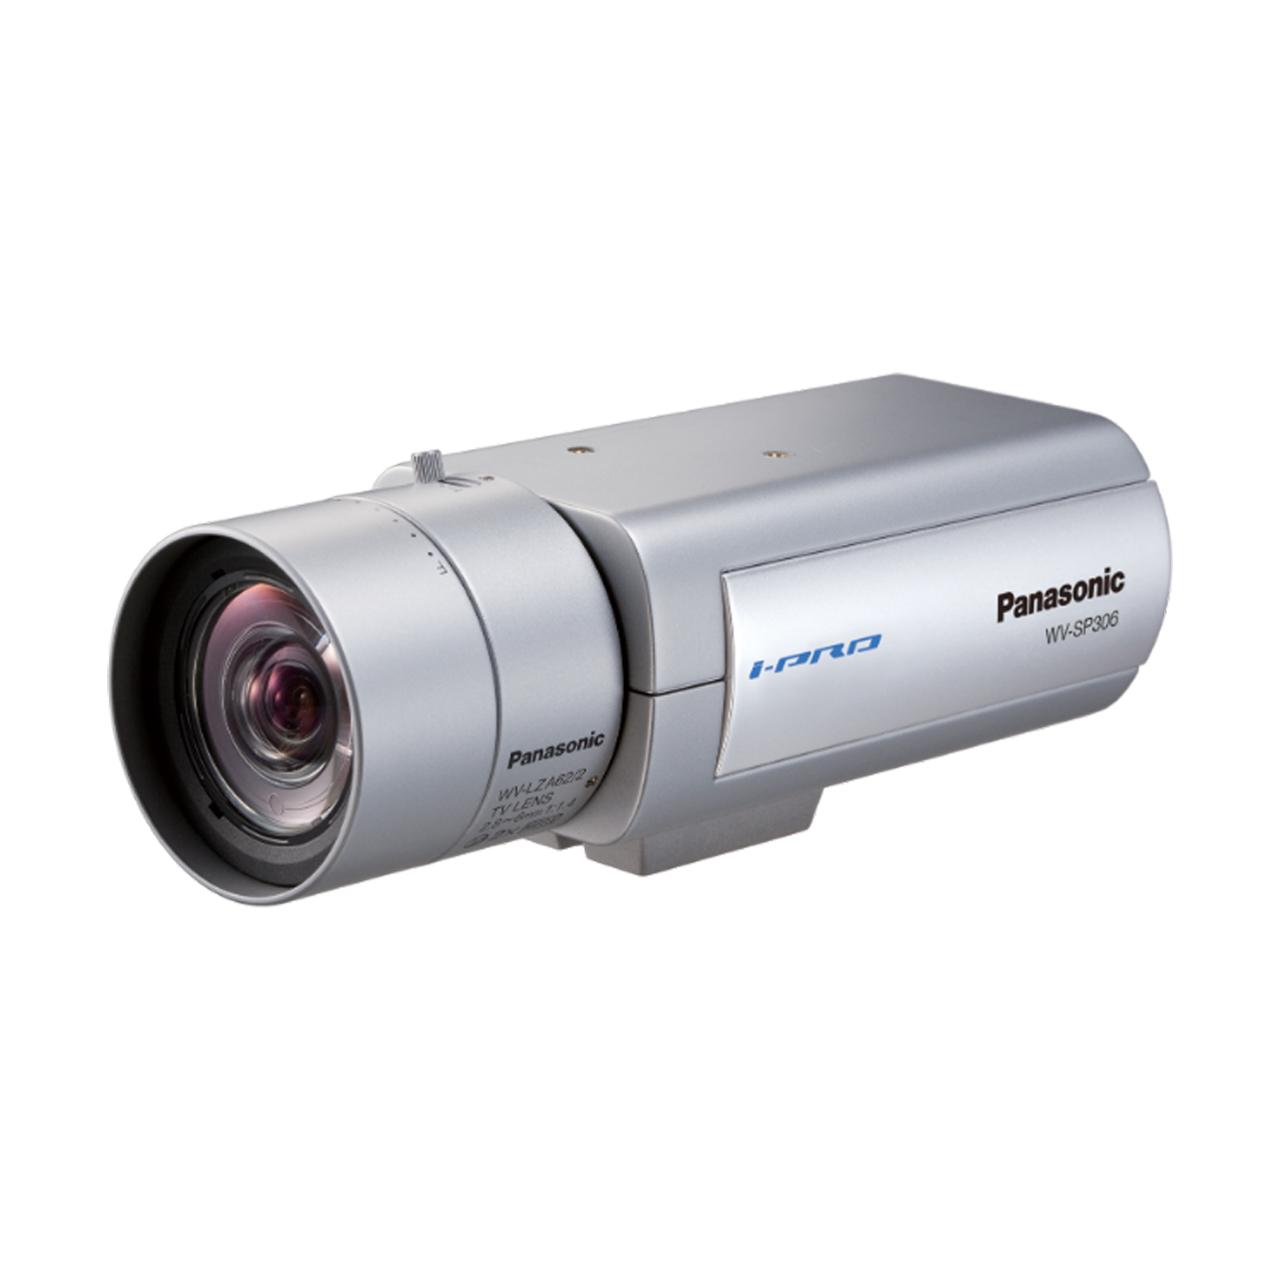 تصویر Panasonic WV-SP306E  Security Camera دوربین مداربسته پاناسونیک مدل WV-SP306E